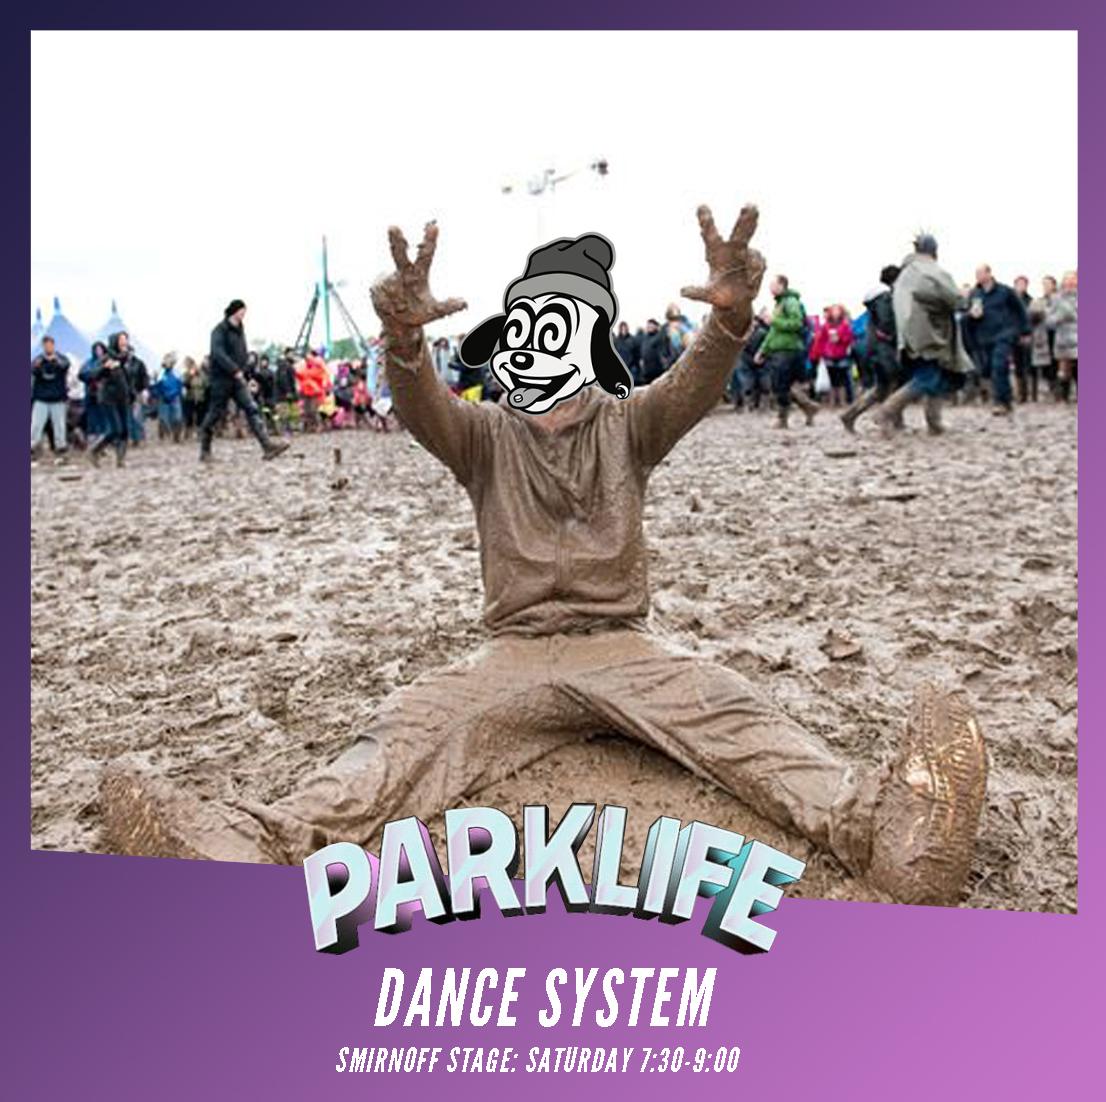 PARKLIFE-ART.jpg